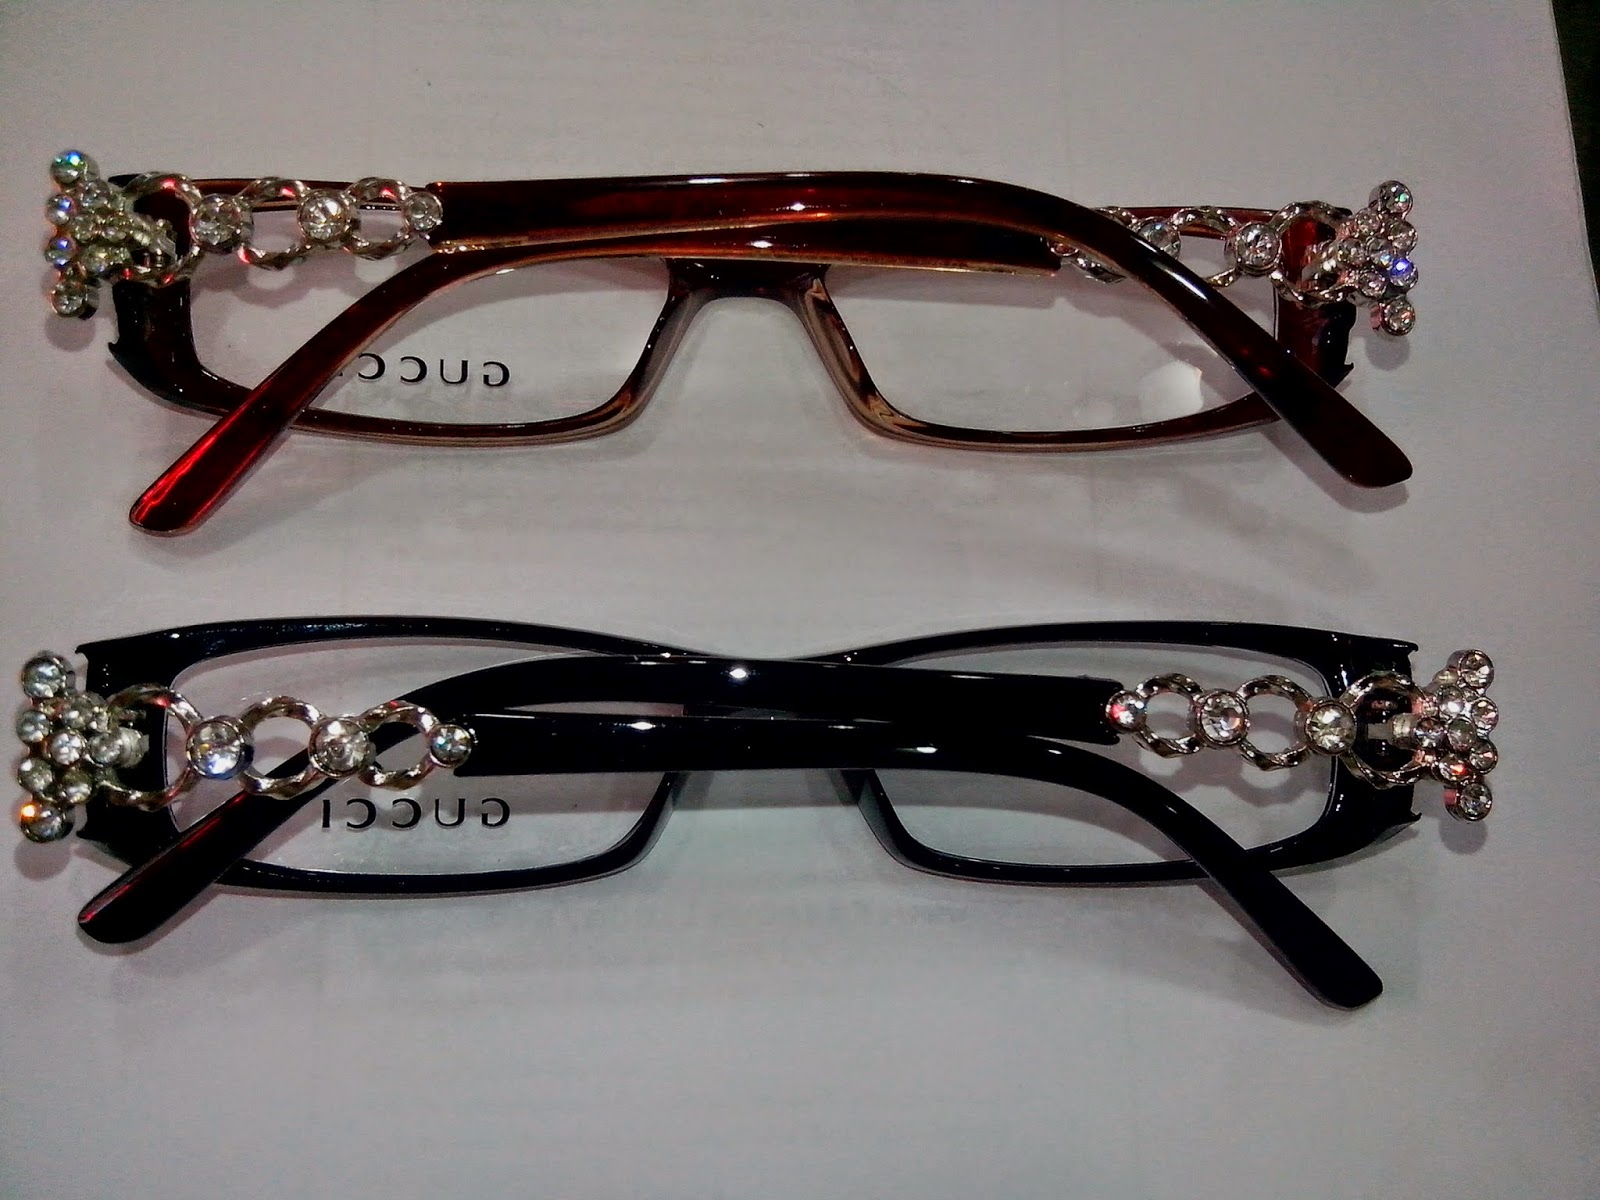 Black Frame Glasses With Diamonds : Buy Frames, Sunglasses,Contact lenses : Plastic Eye wear ...